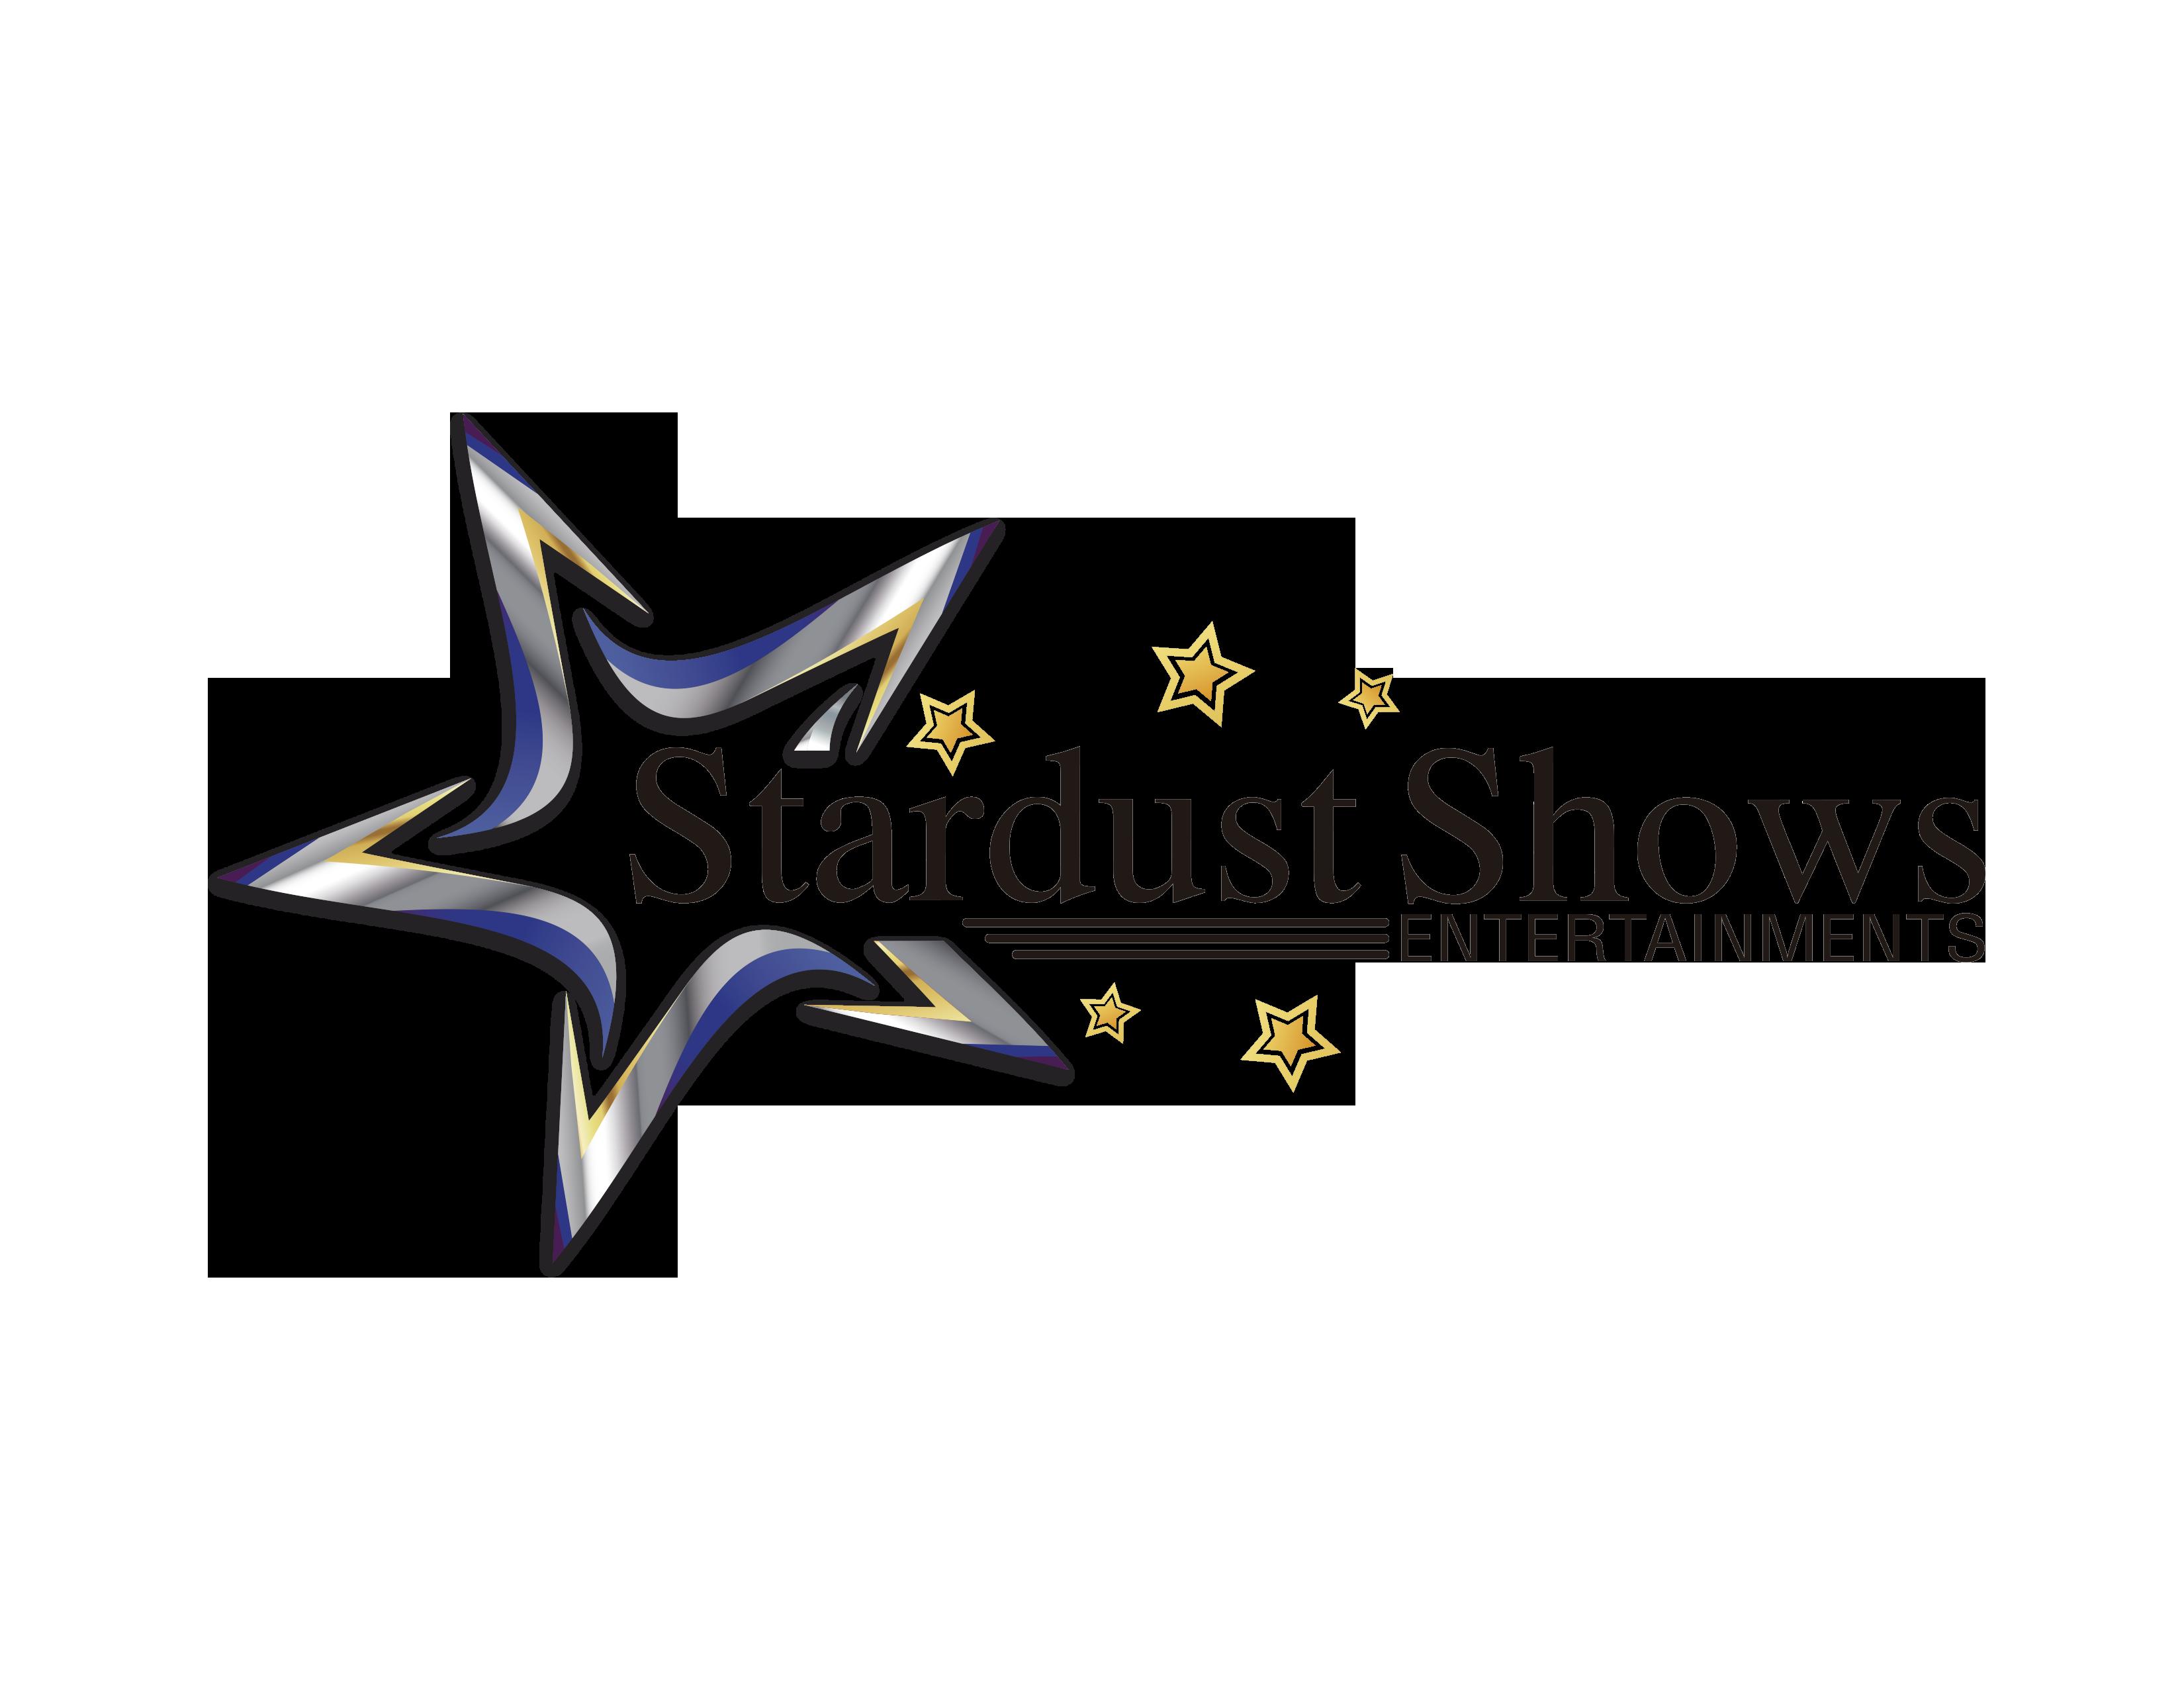 Stardust Shows Entertainments